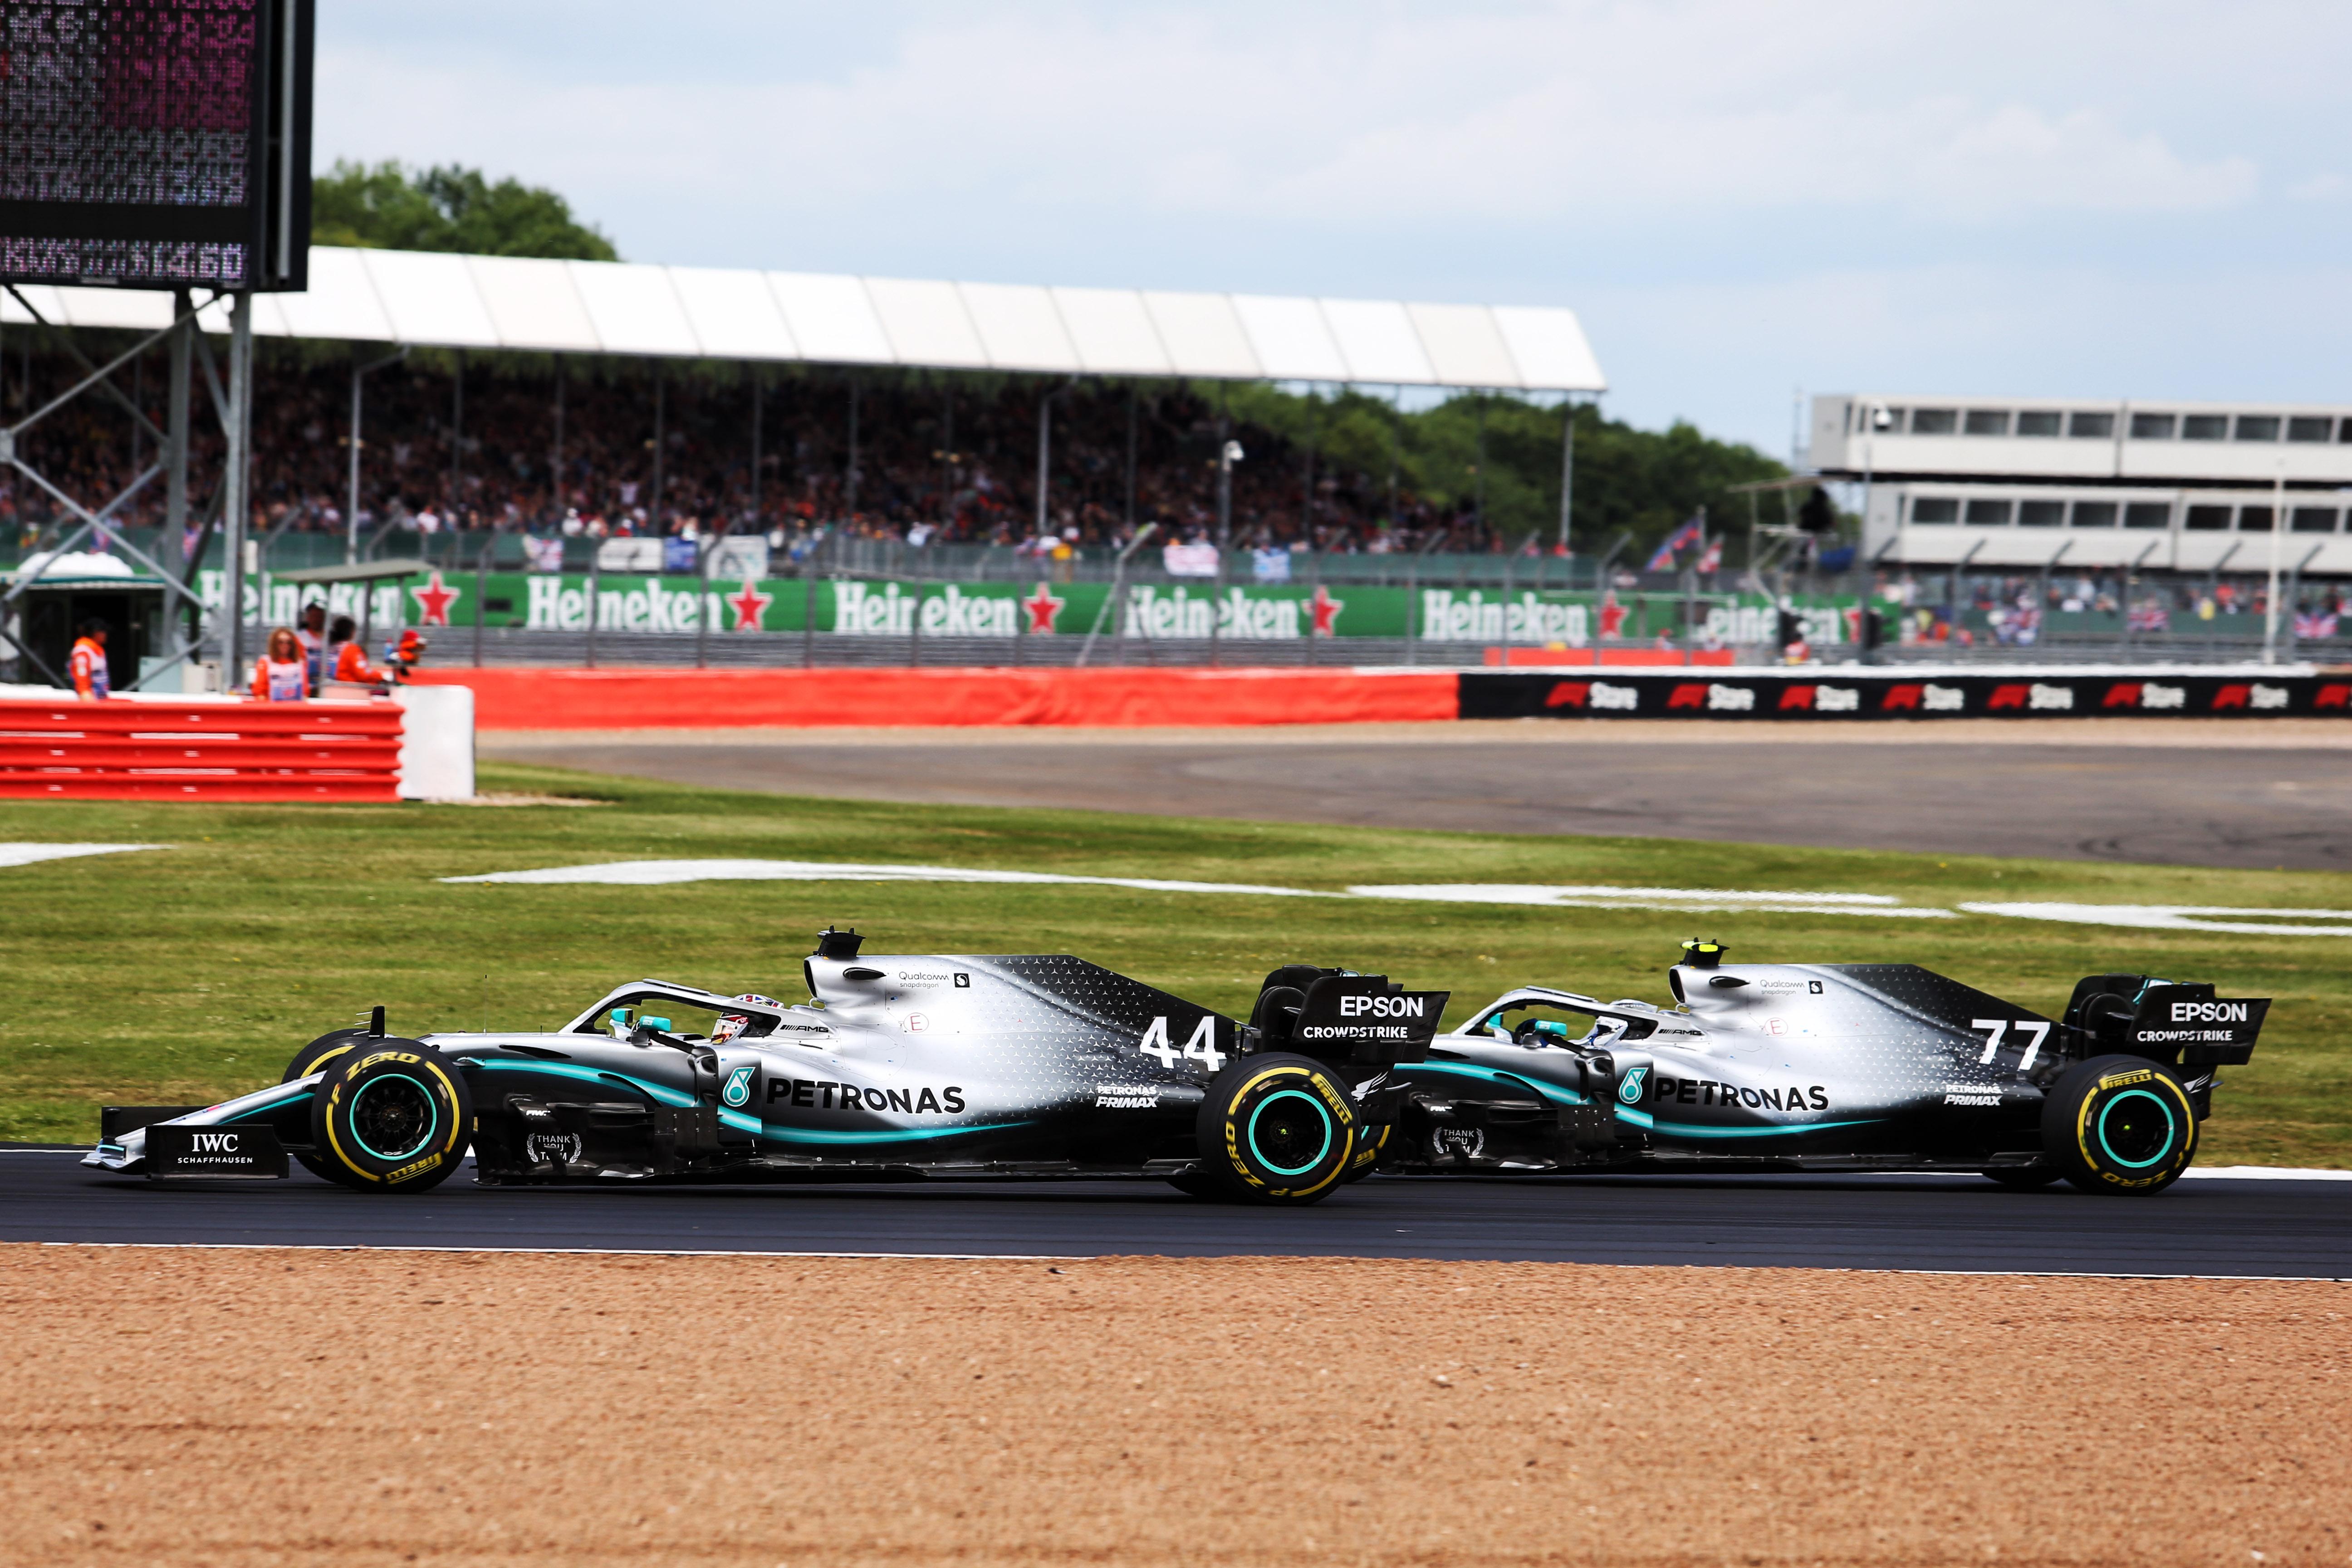 Lewis Hamilton Valterri Bottas Mercedes British Grand Prix 2019 Silverstone